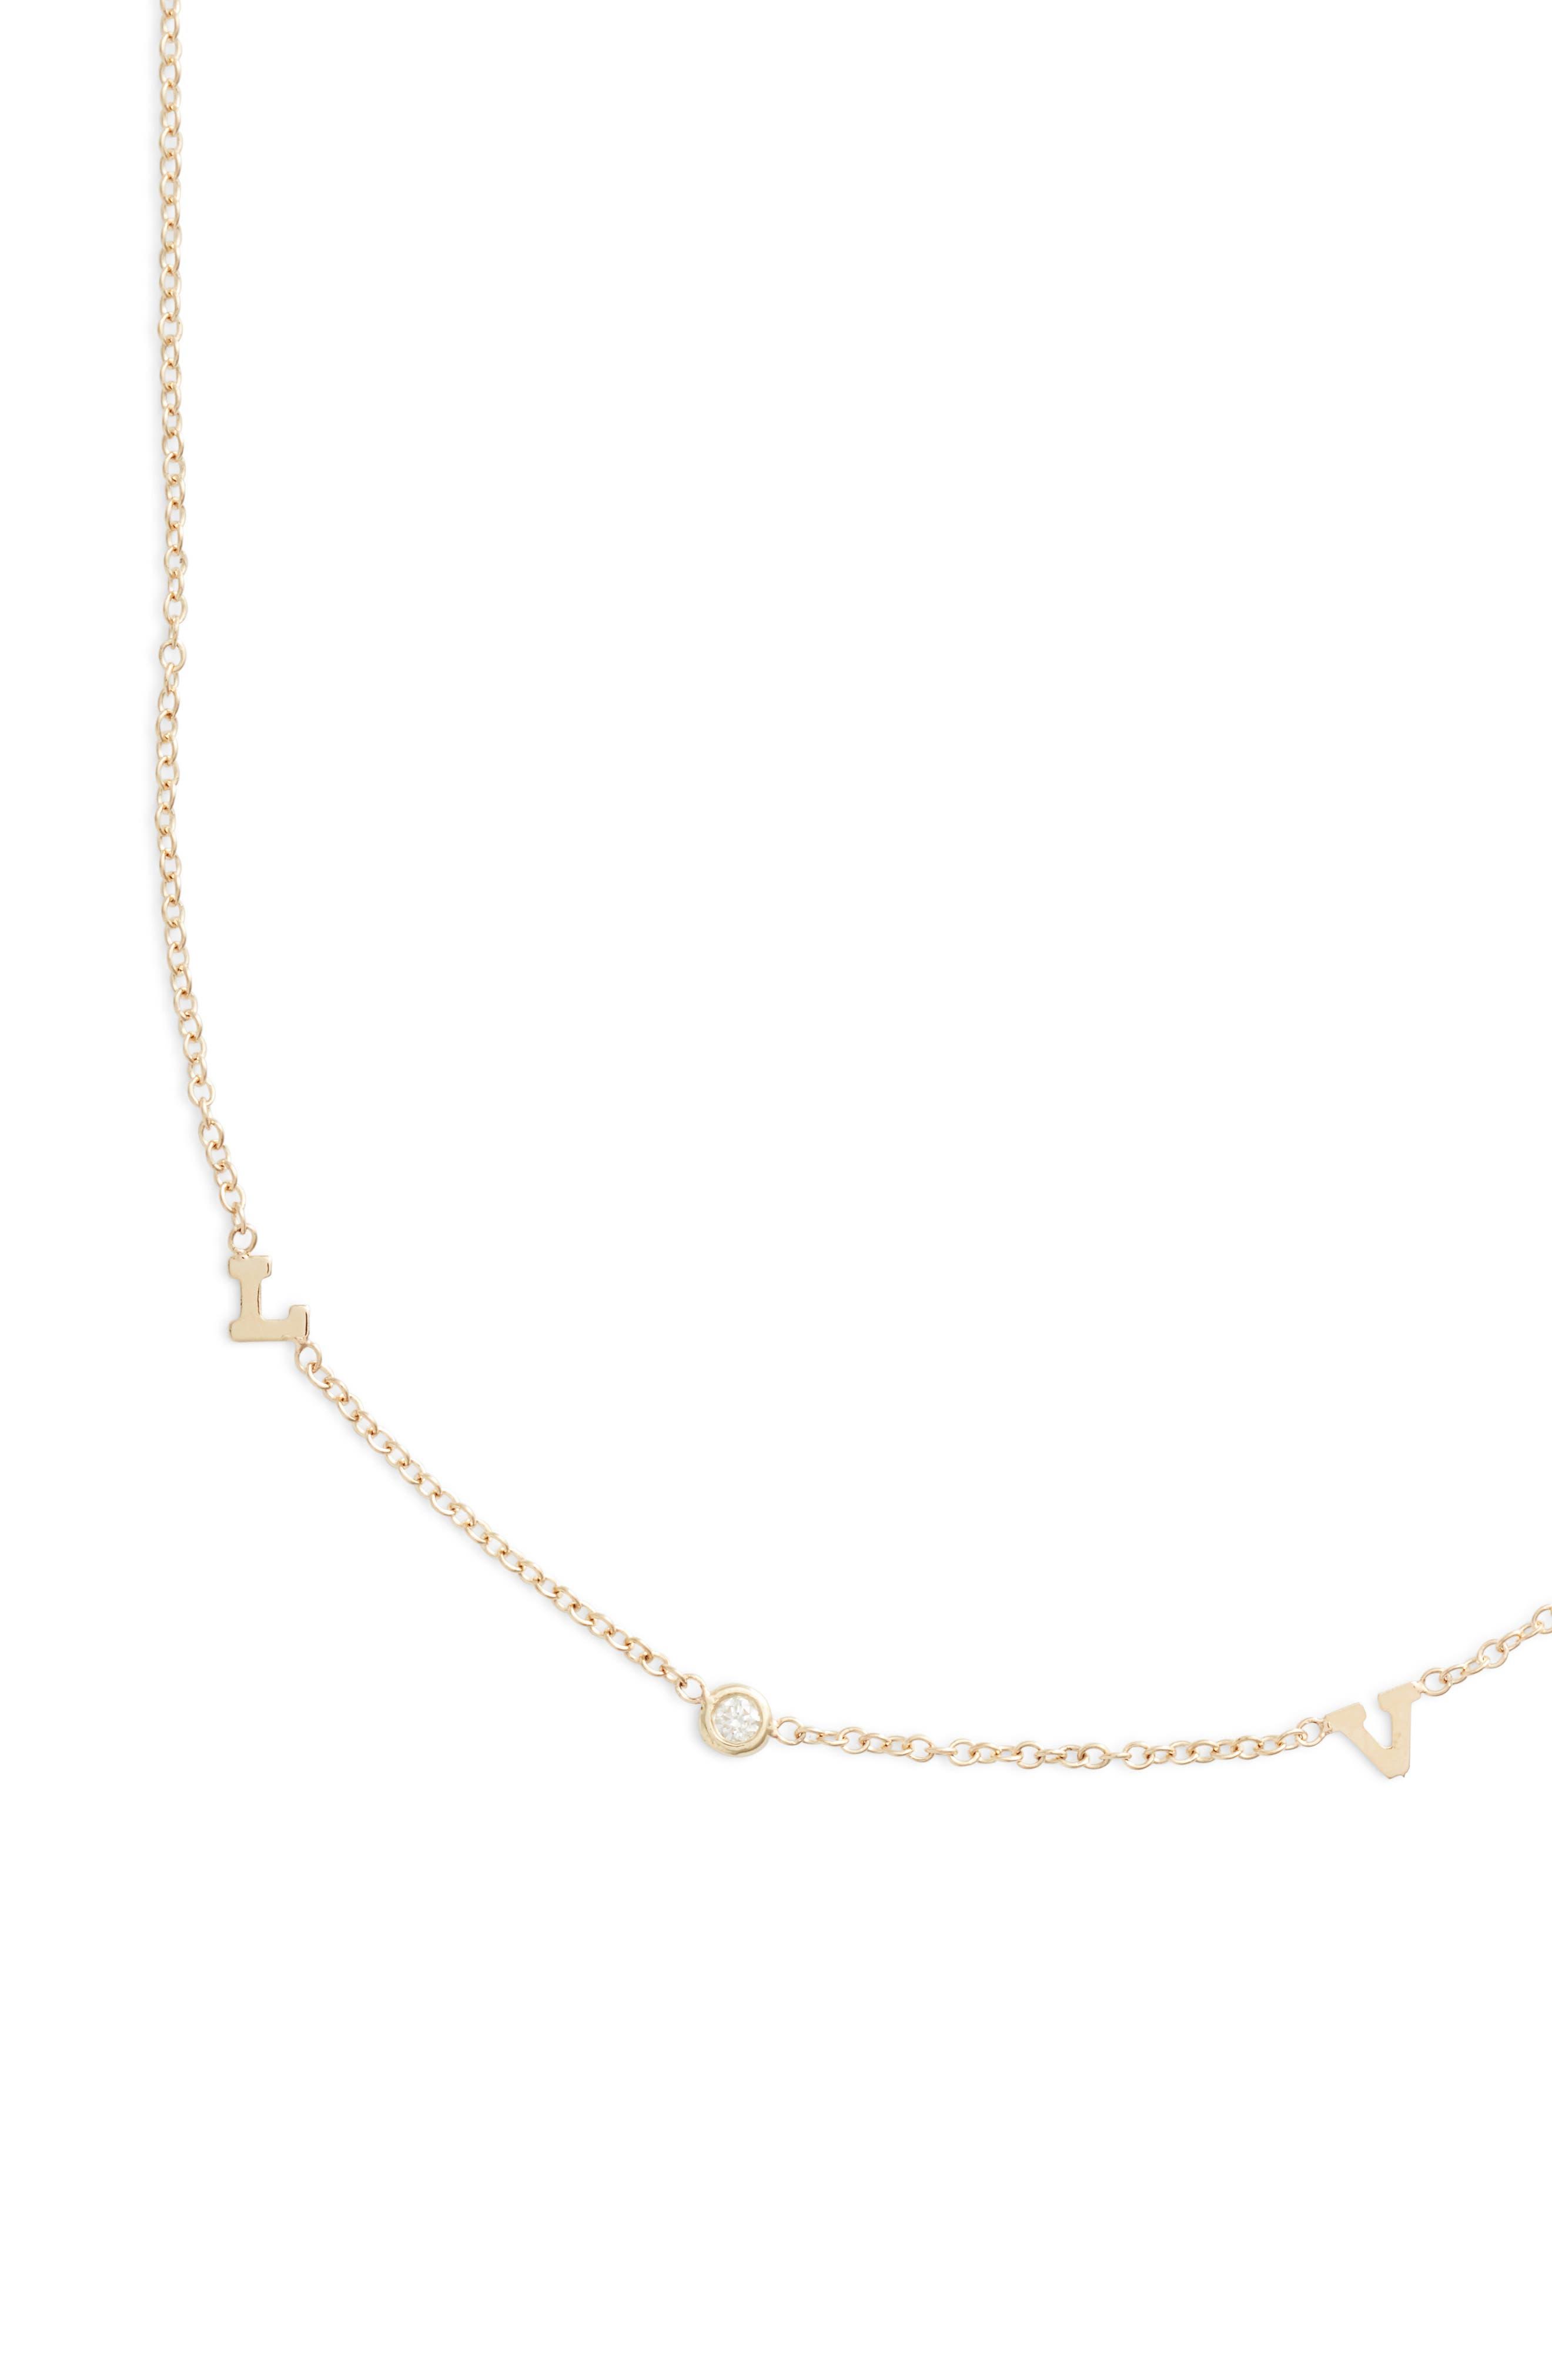 Zoe Chicco Itty Bitty Love Diamond Necklace